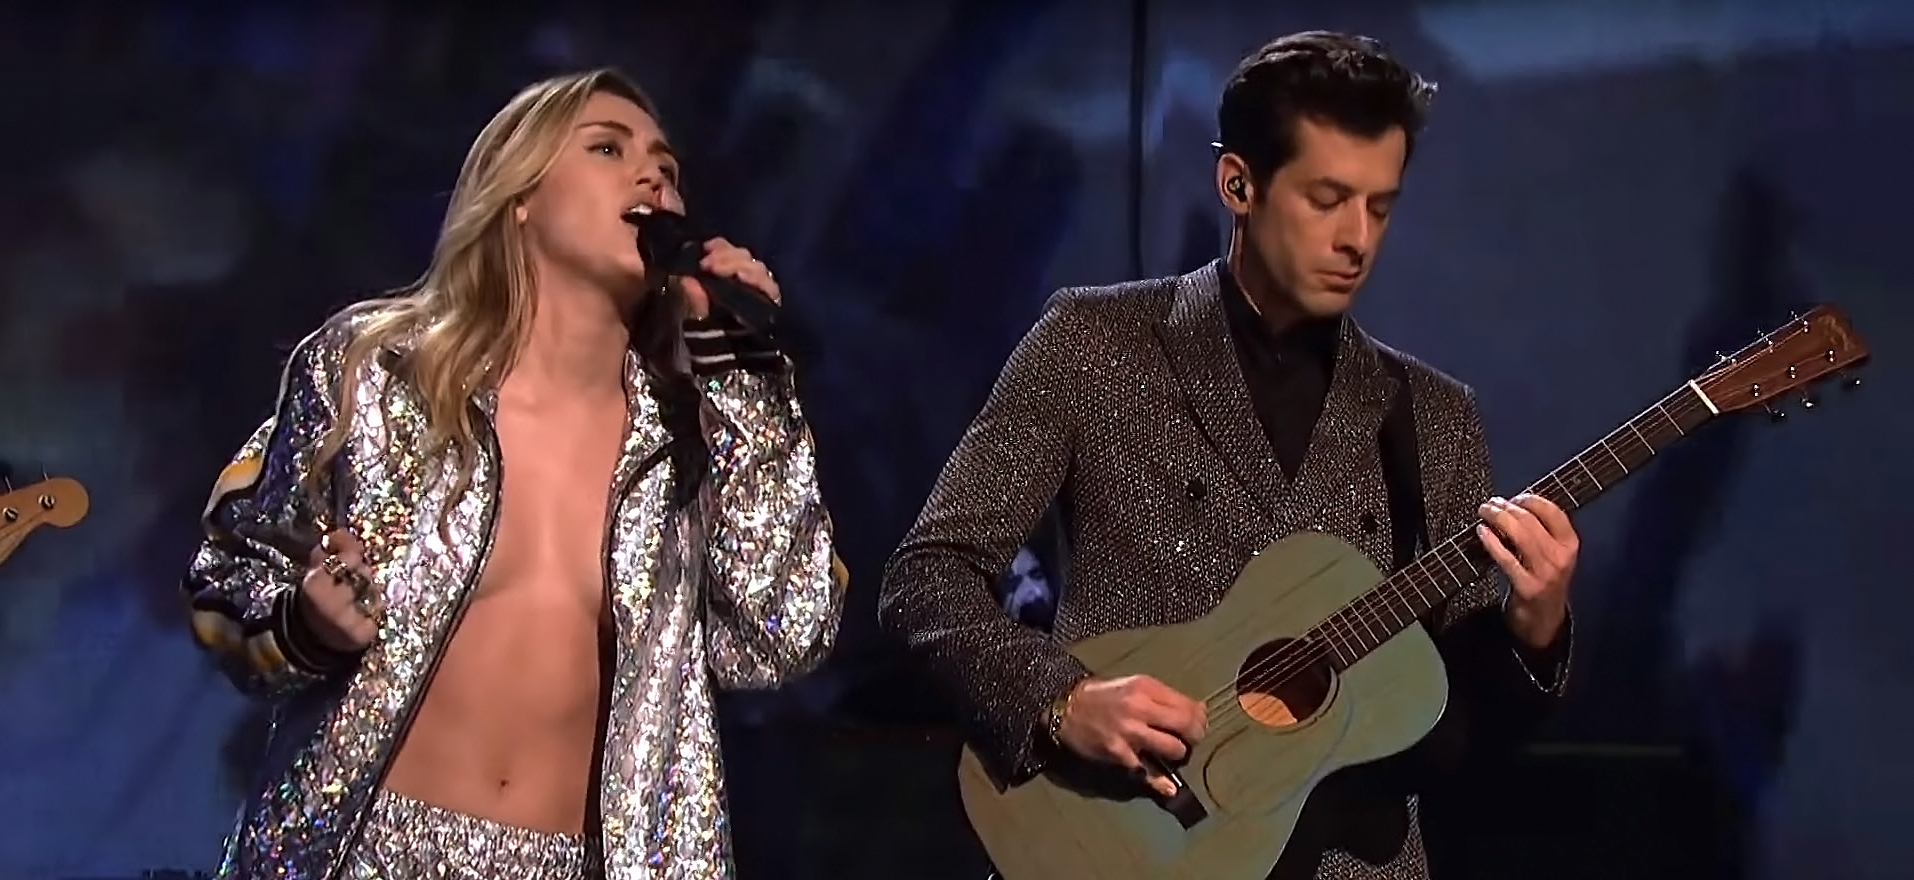 Miley Cyrus Risks A Nip Slip Snl Twitter Reacts